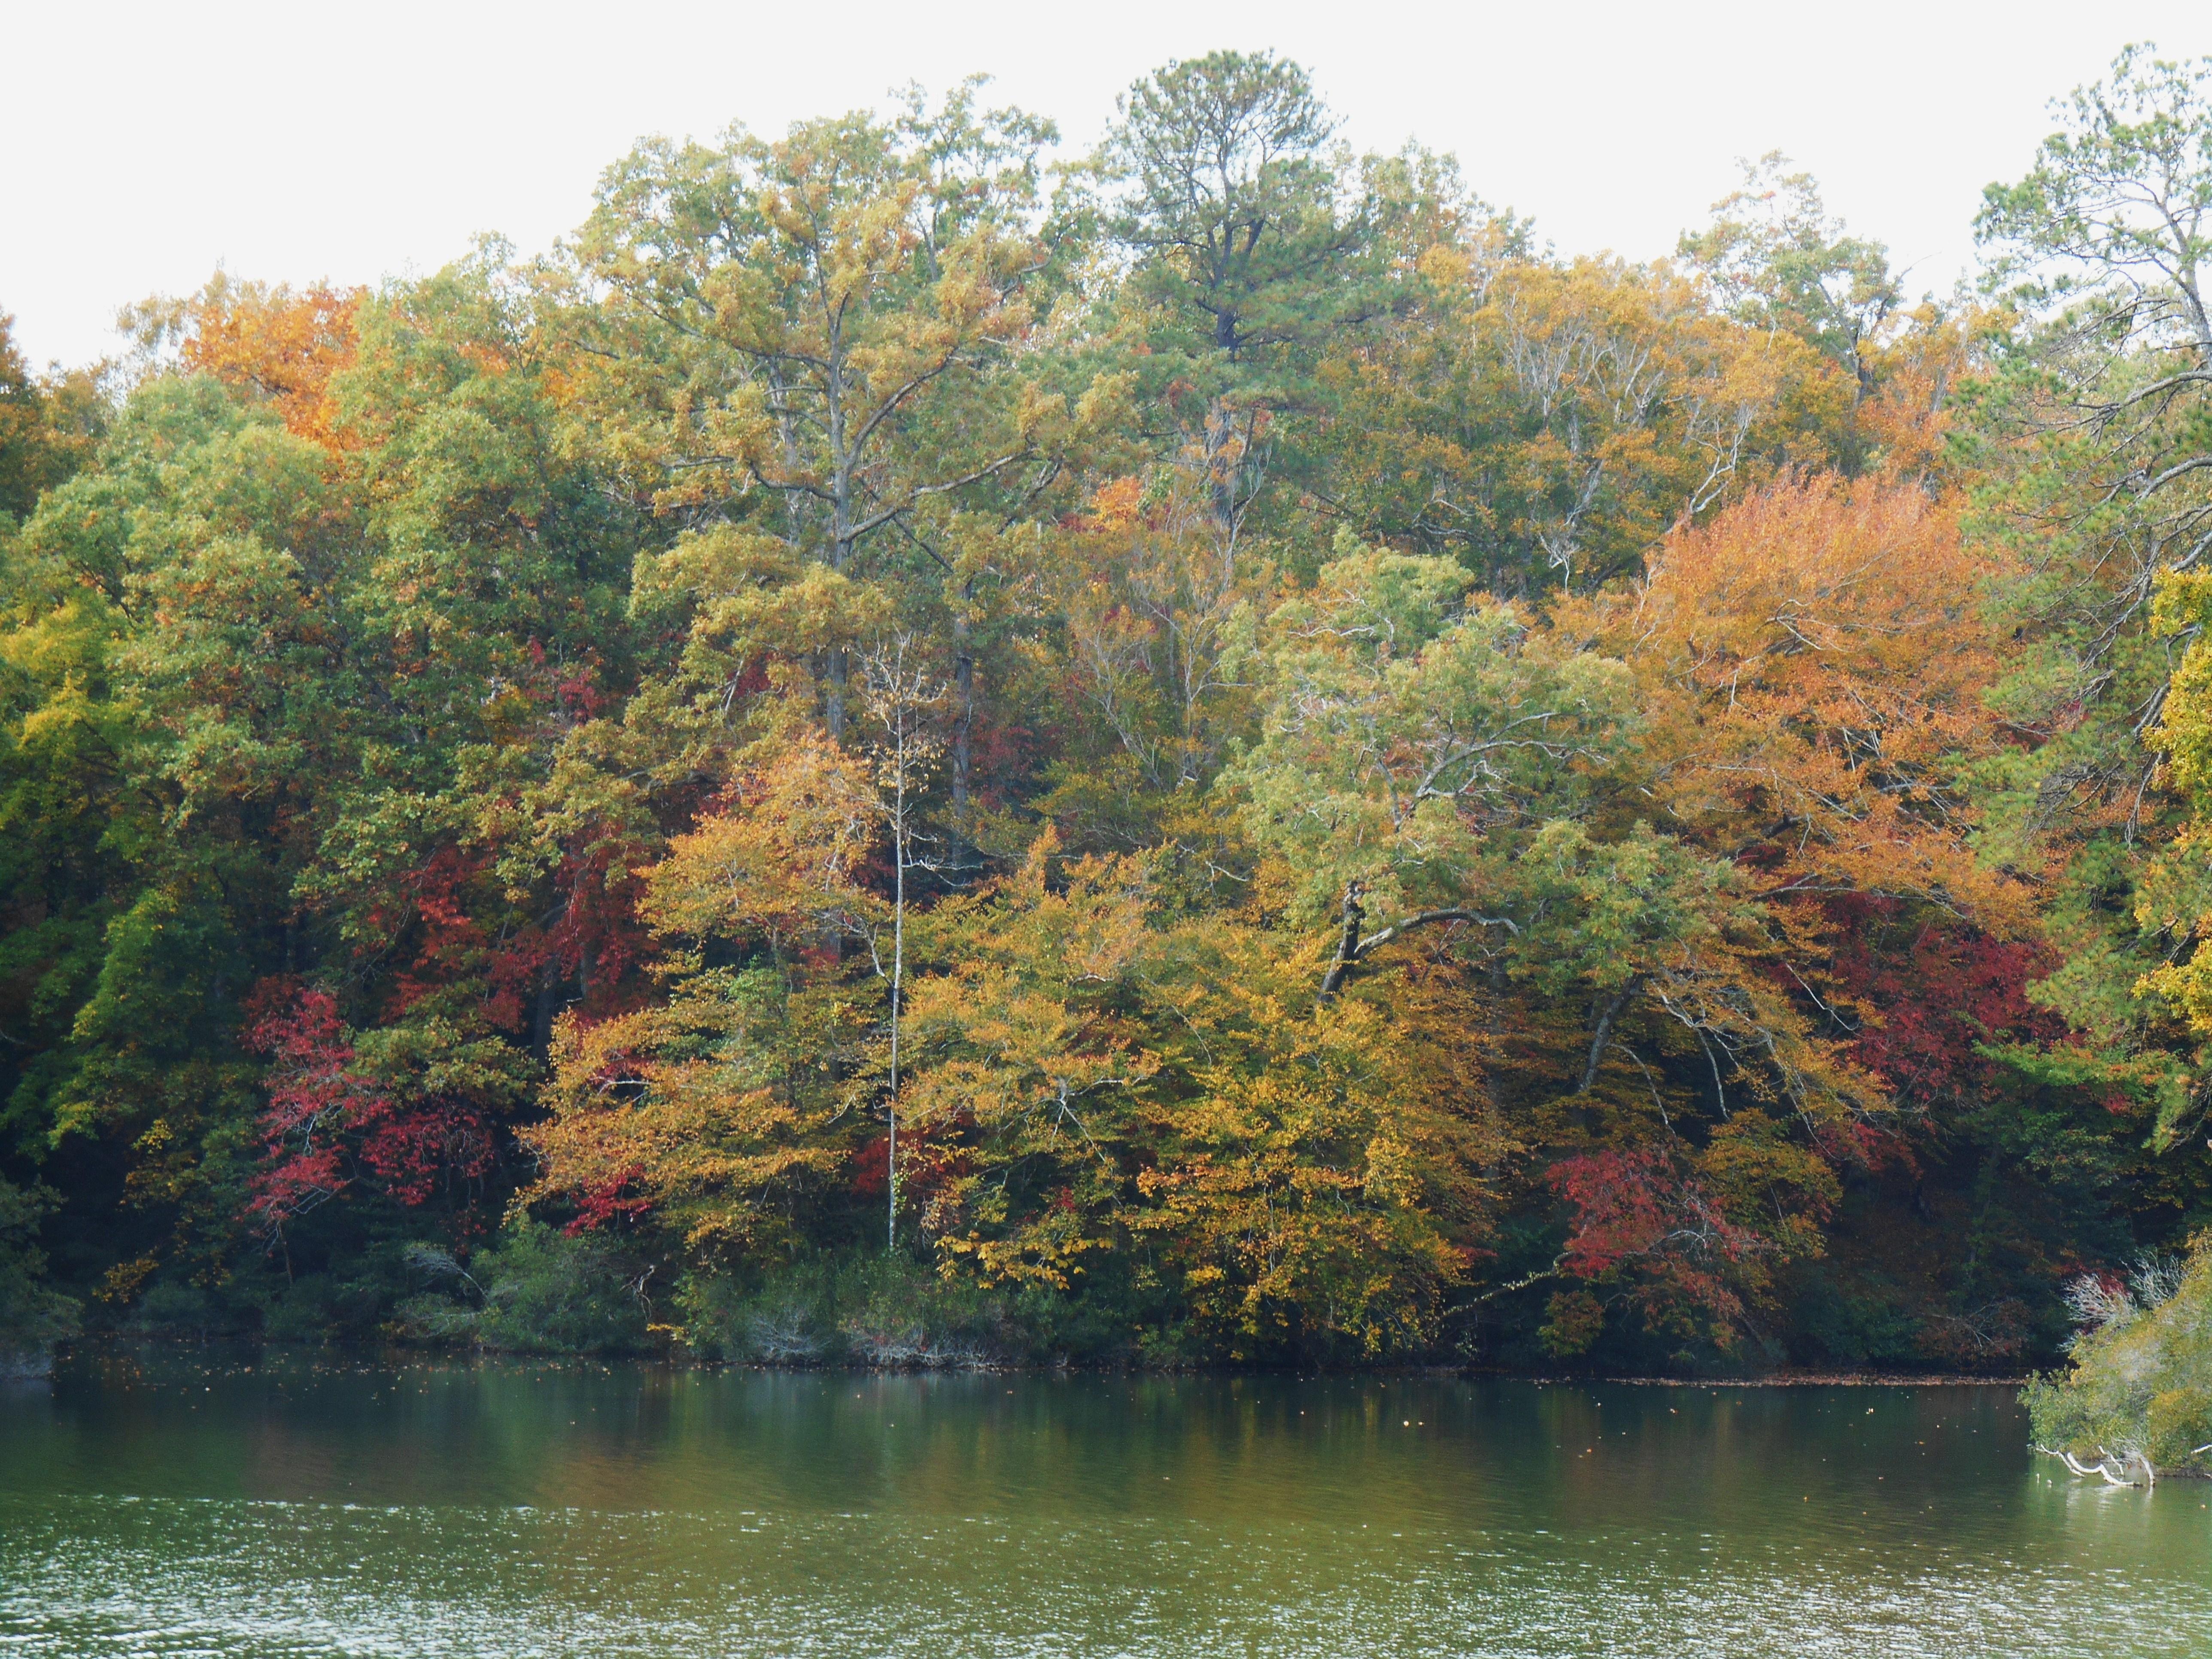 October 29, 2014 fall color 031